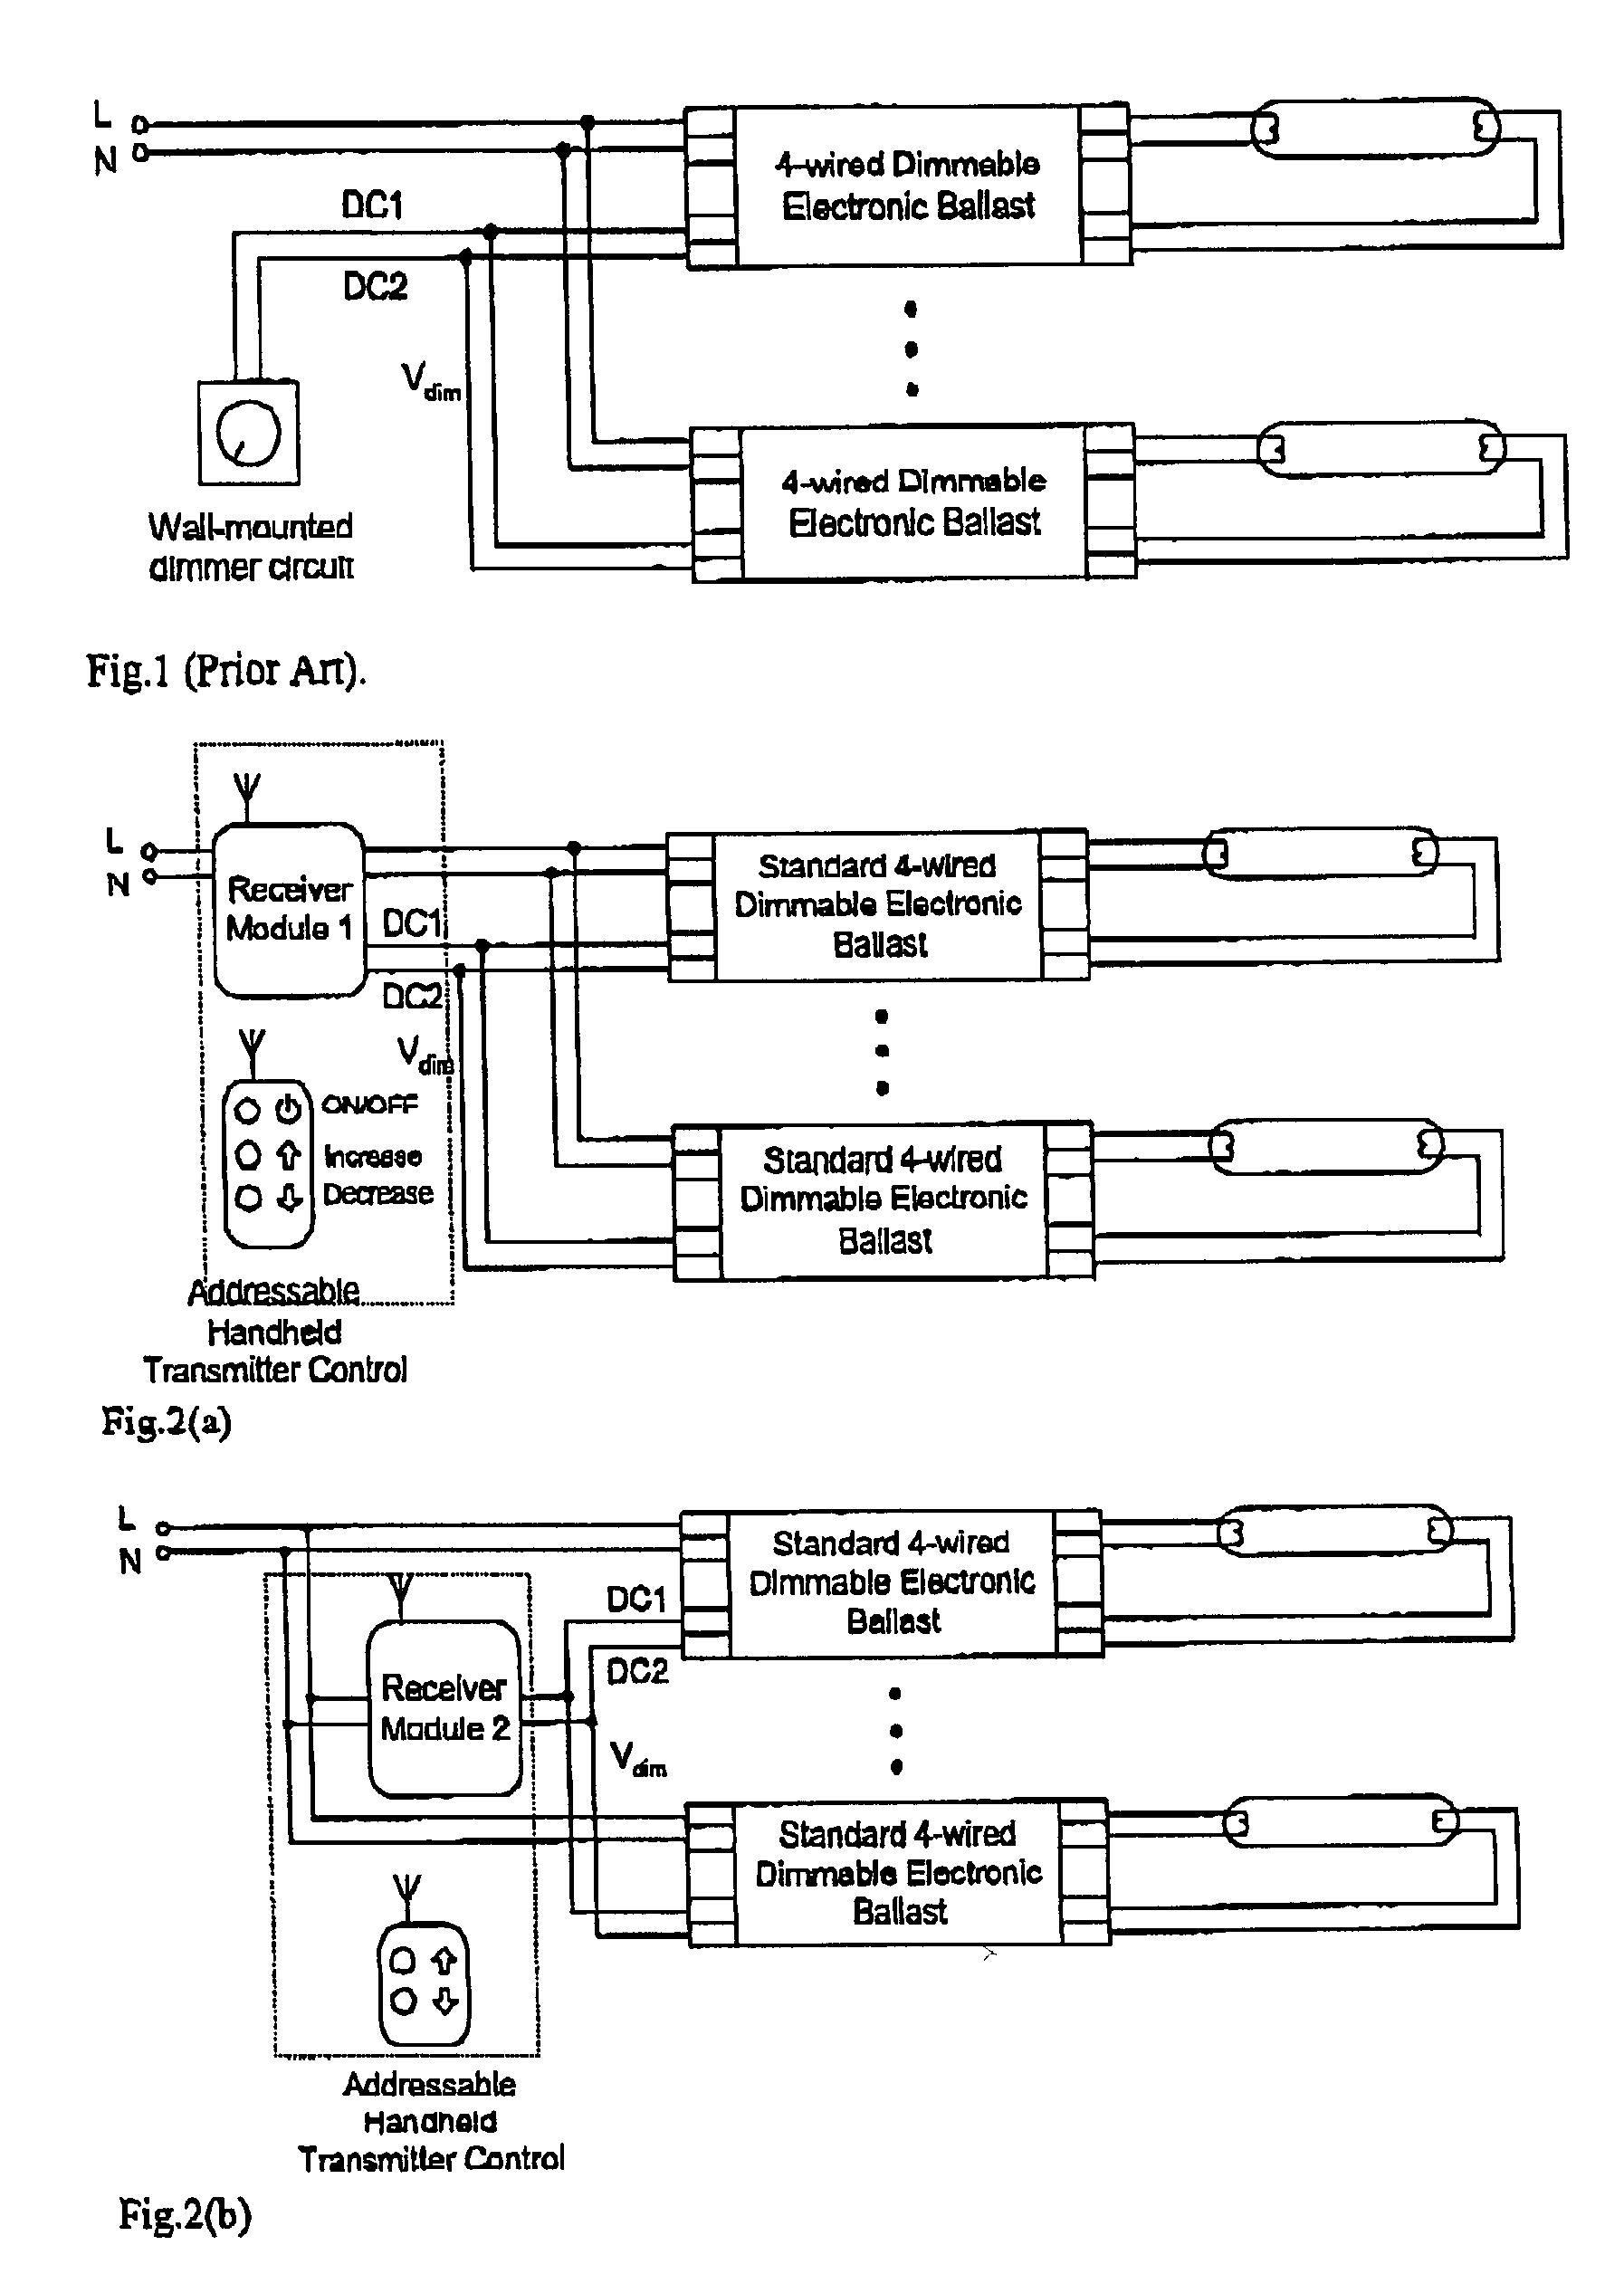 Stupendous Step Dimming Ballast Wiring Diagram Wiring Diagram M6 Wiring Cloud Icalpermsplehendilmohammedshrineorg